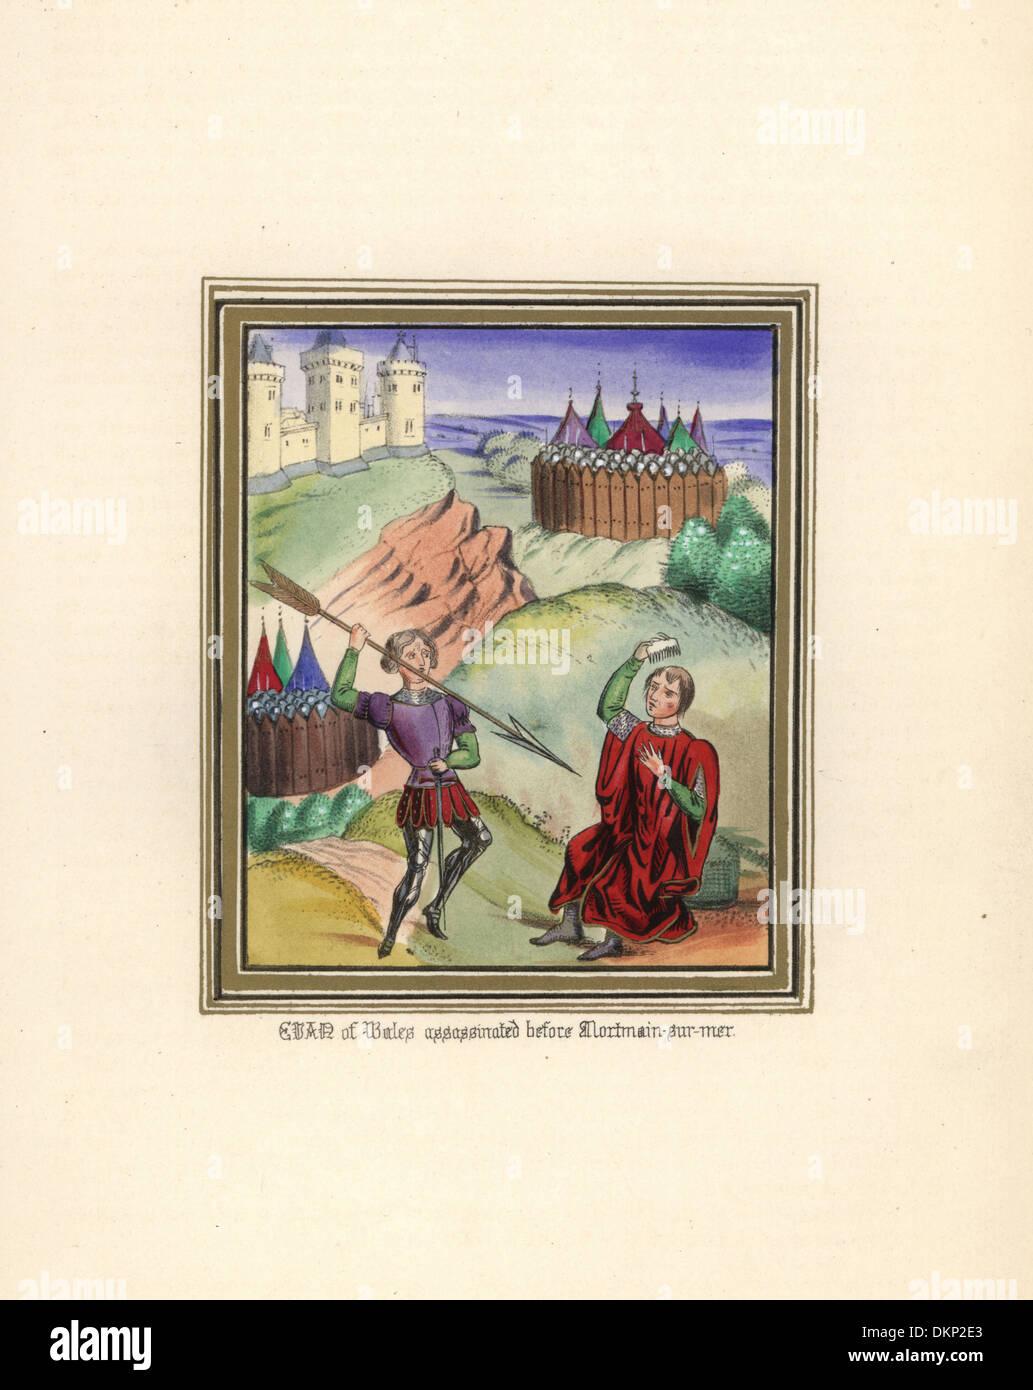 Evan of Wales assassinated by John Lambe at Mortmain-sur-mer, 1381. - Stock Image